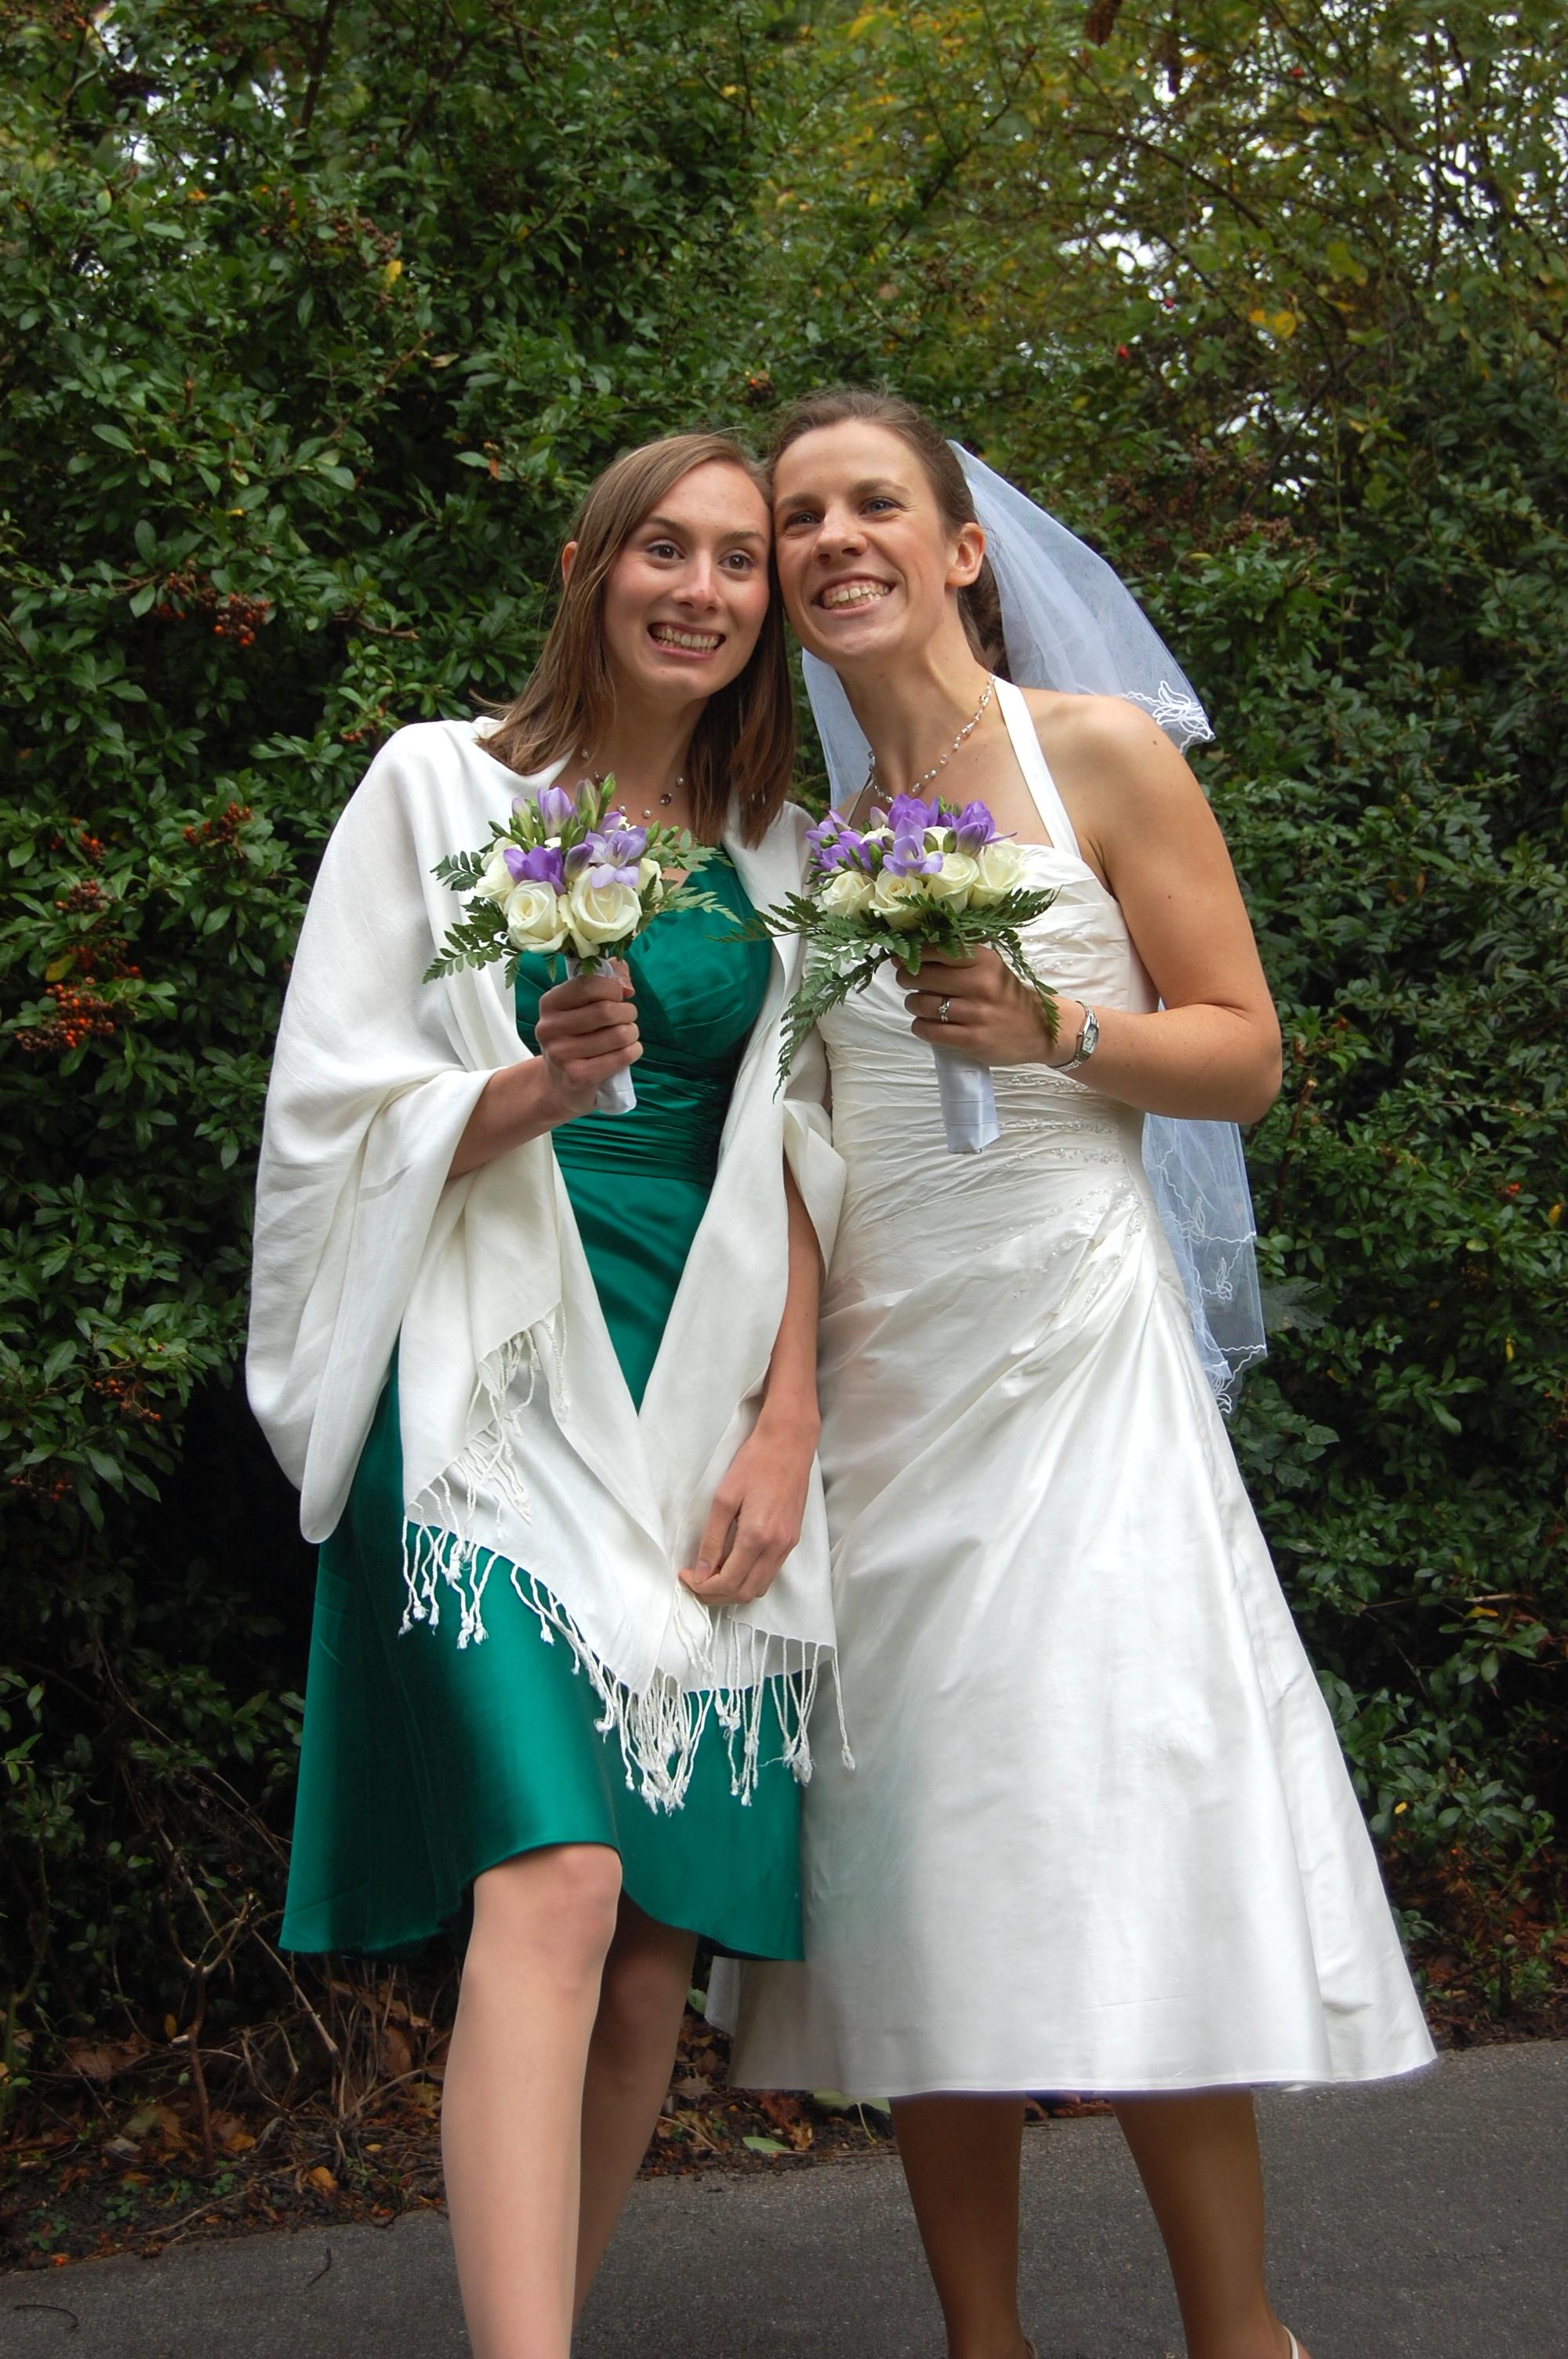 wedding flowers in houston area